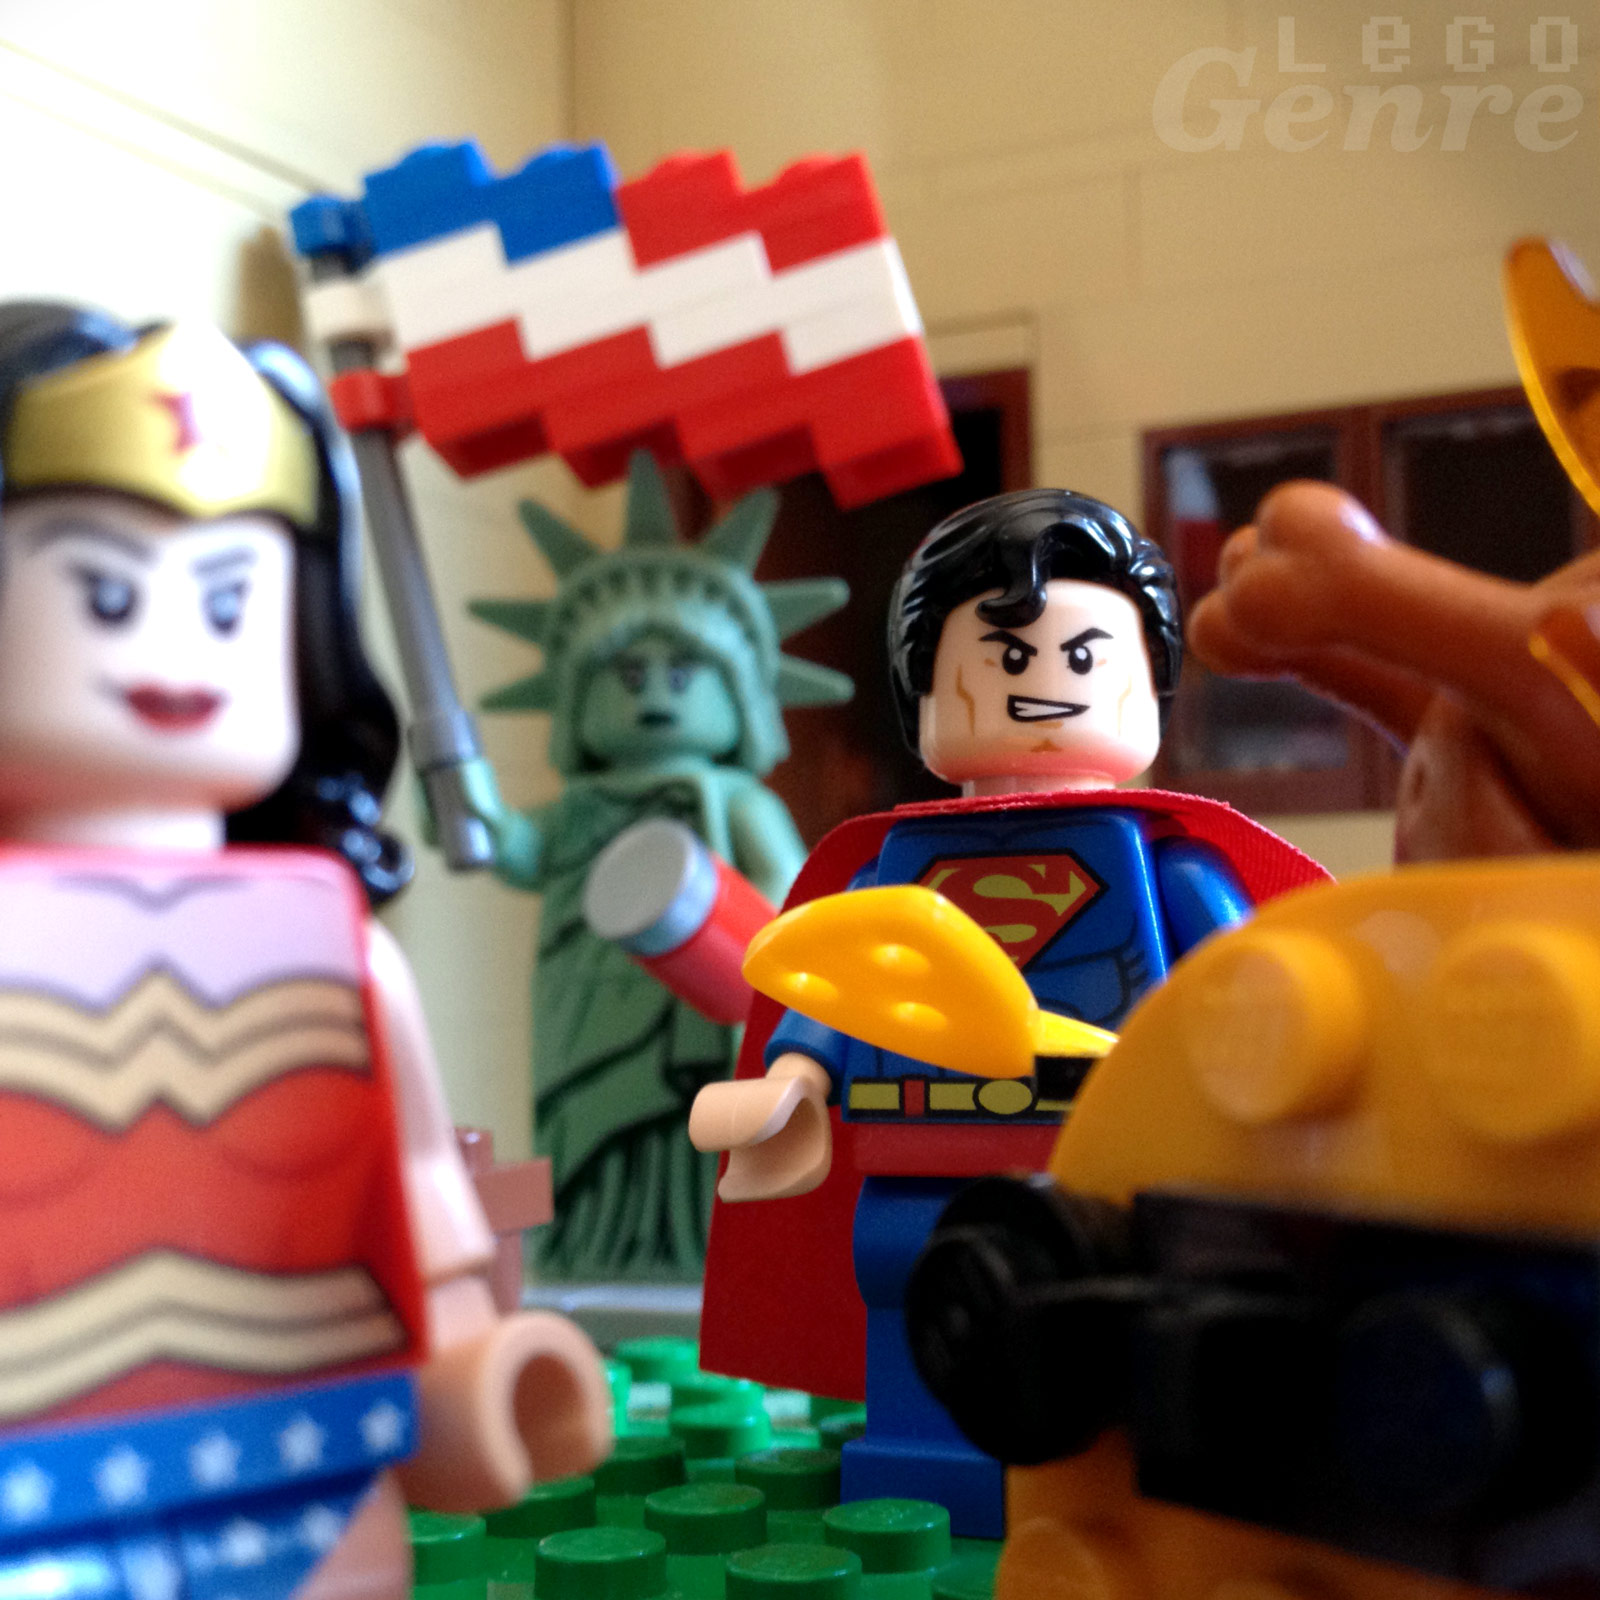 LegoGenre: Fourth of July